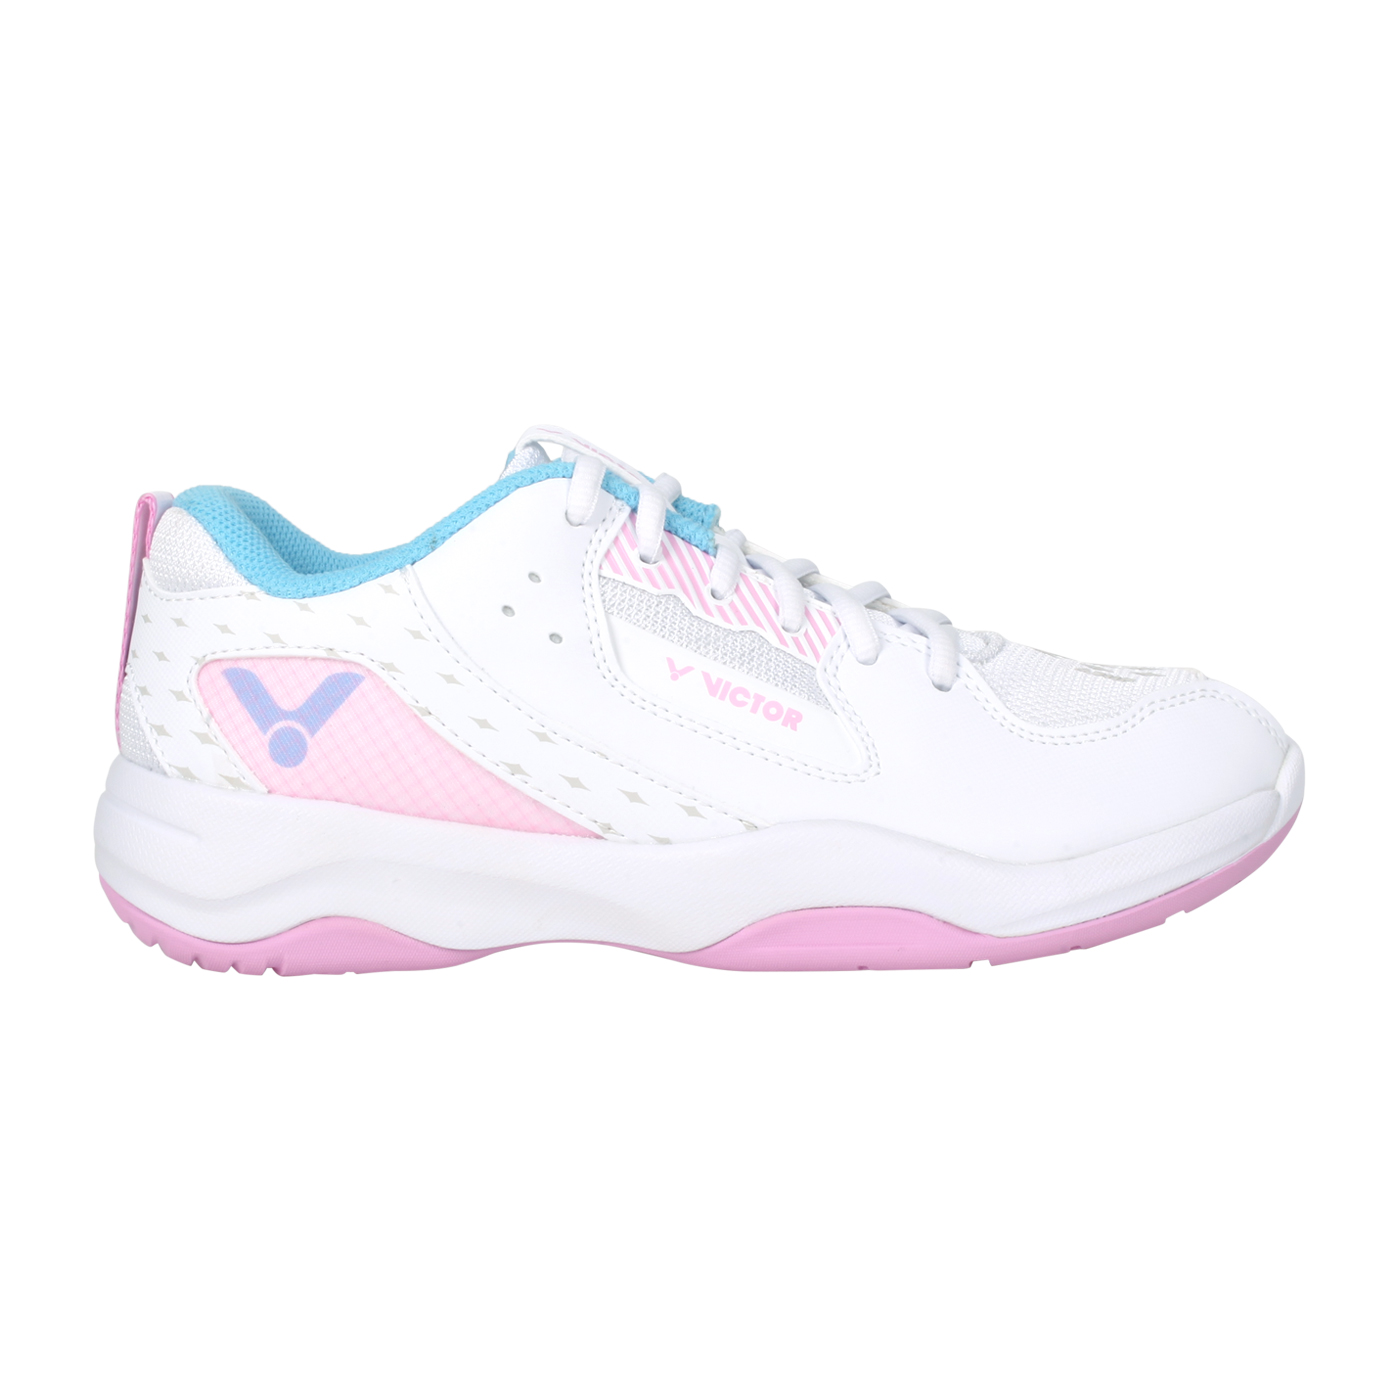 VICTOR 女款羽球鞋 A311F-A